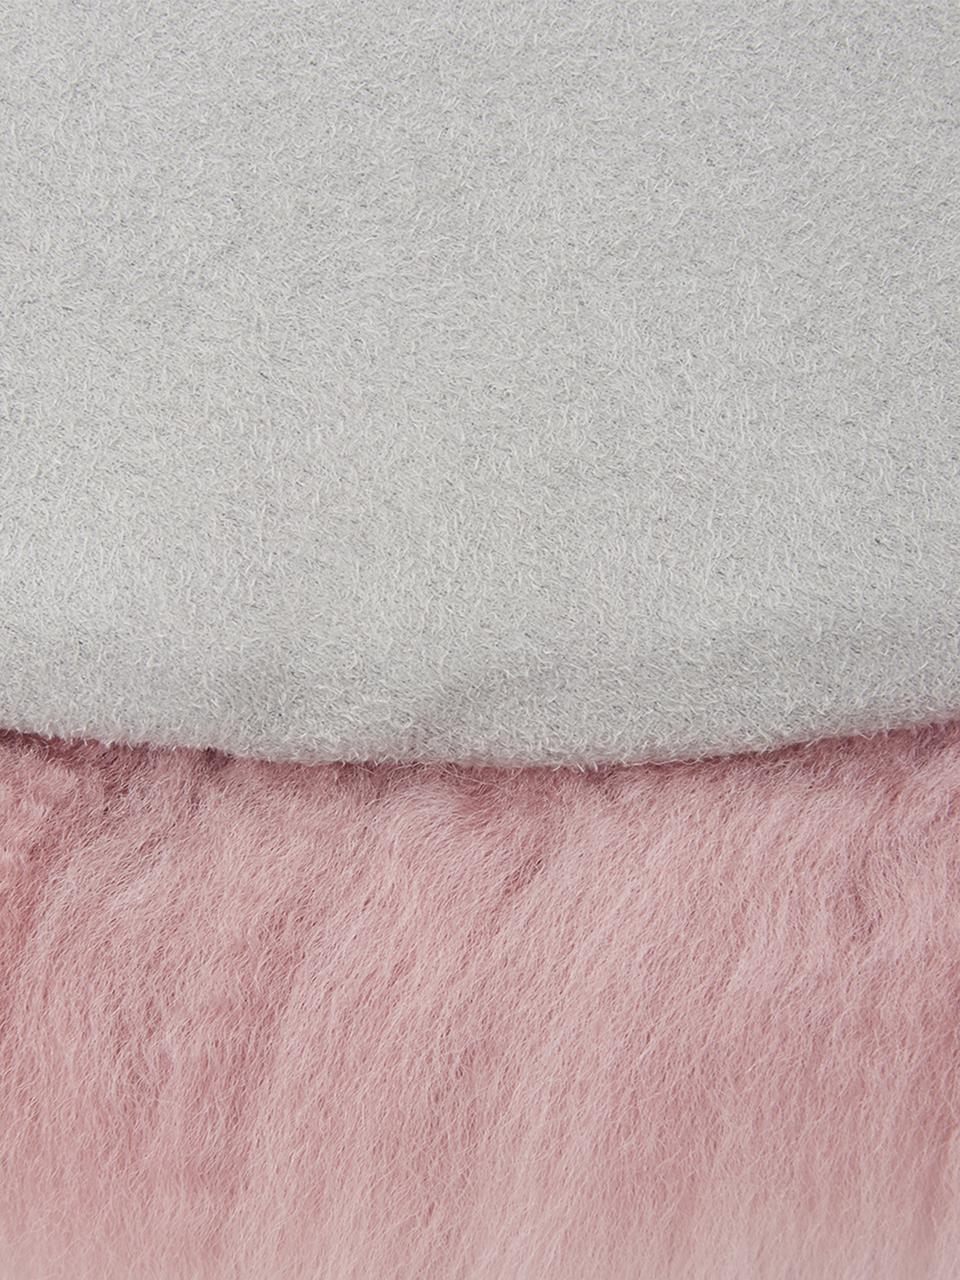 Runde Schaffell-Sitzauflage Oslo, glatt, Flor: 100% Schaffell, Rückseite: 100% Polyester, Rosa, Ø 37 cm